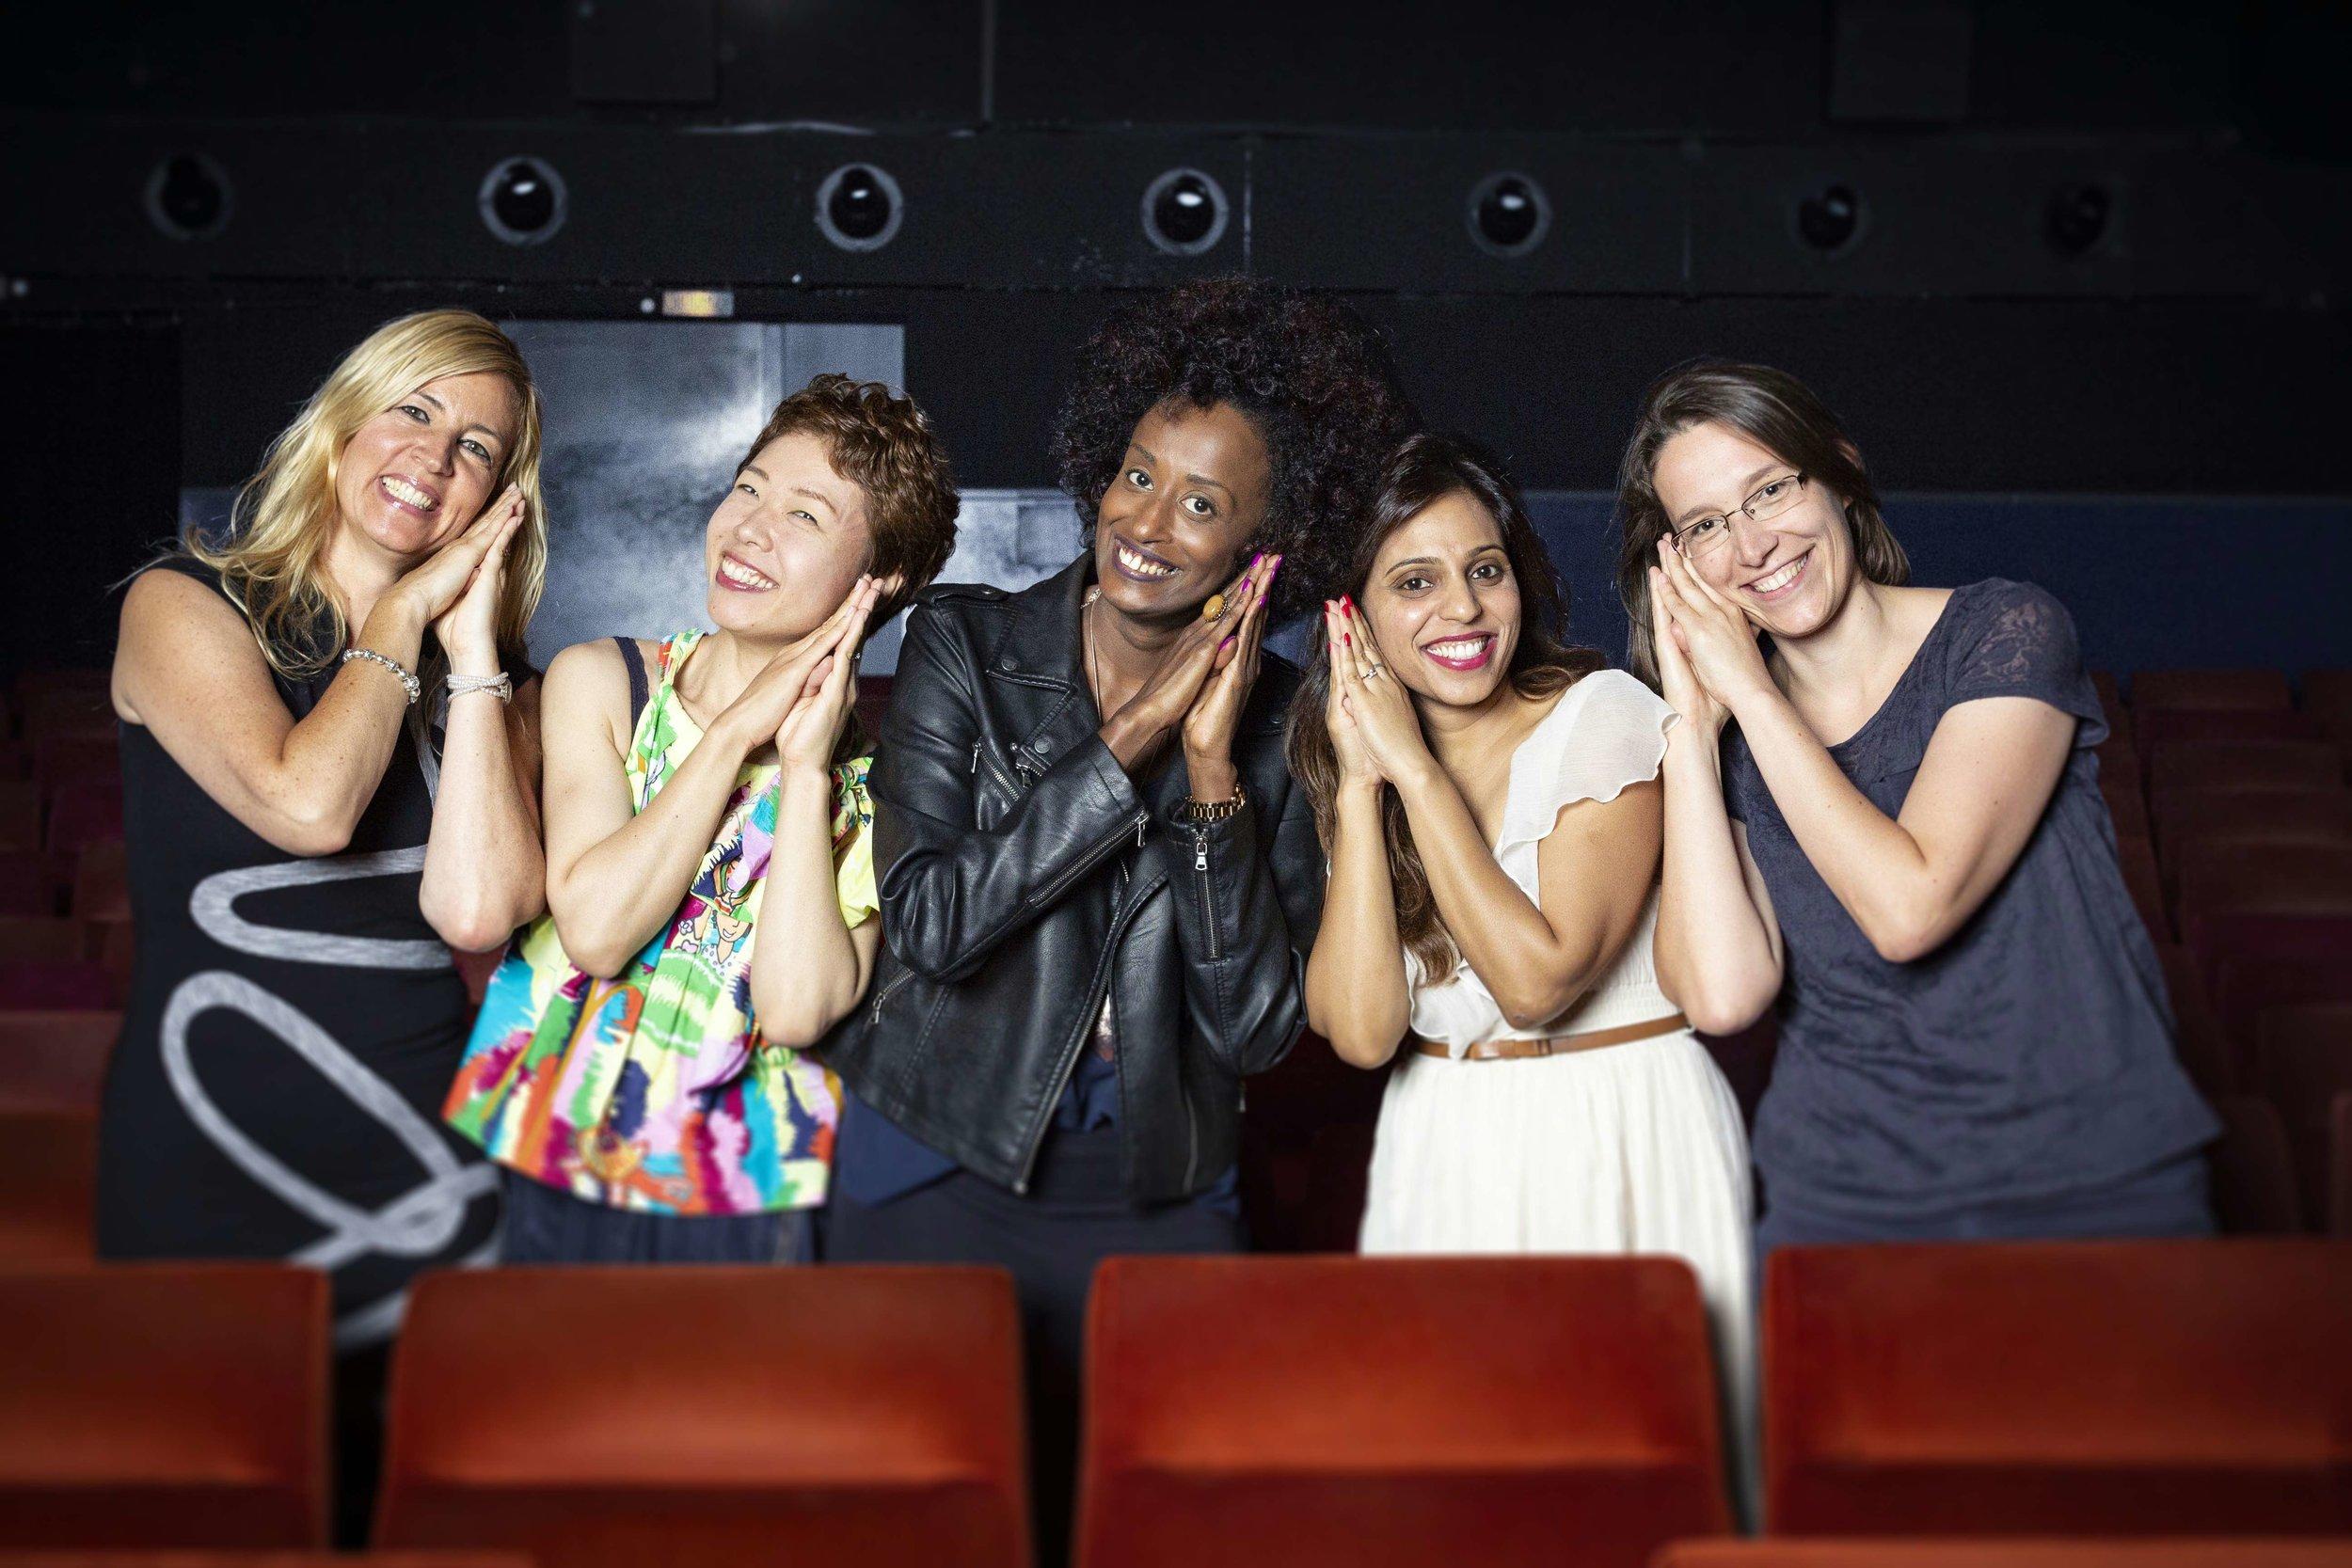 From left Deborah Feldmann,Rokudenashiko, Leyla Hussein, Vithika Yadav and Doris Wagner